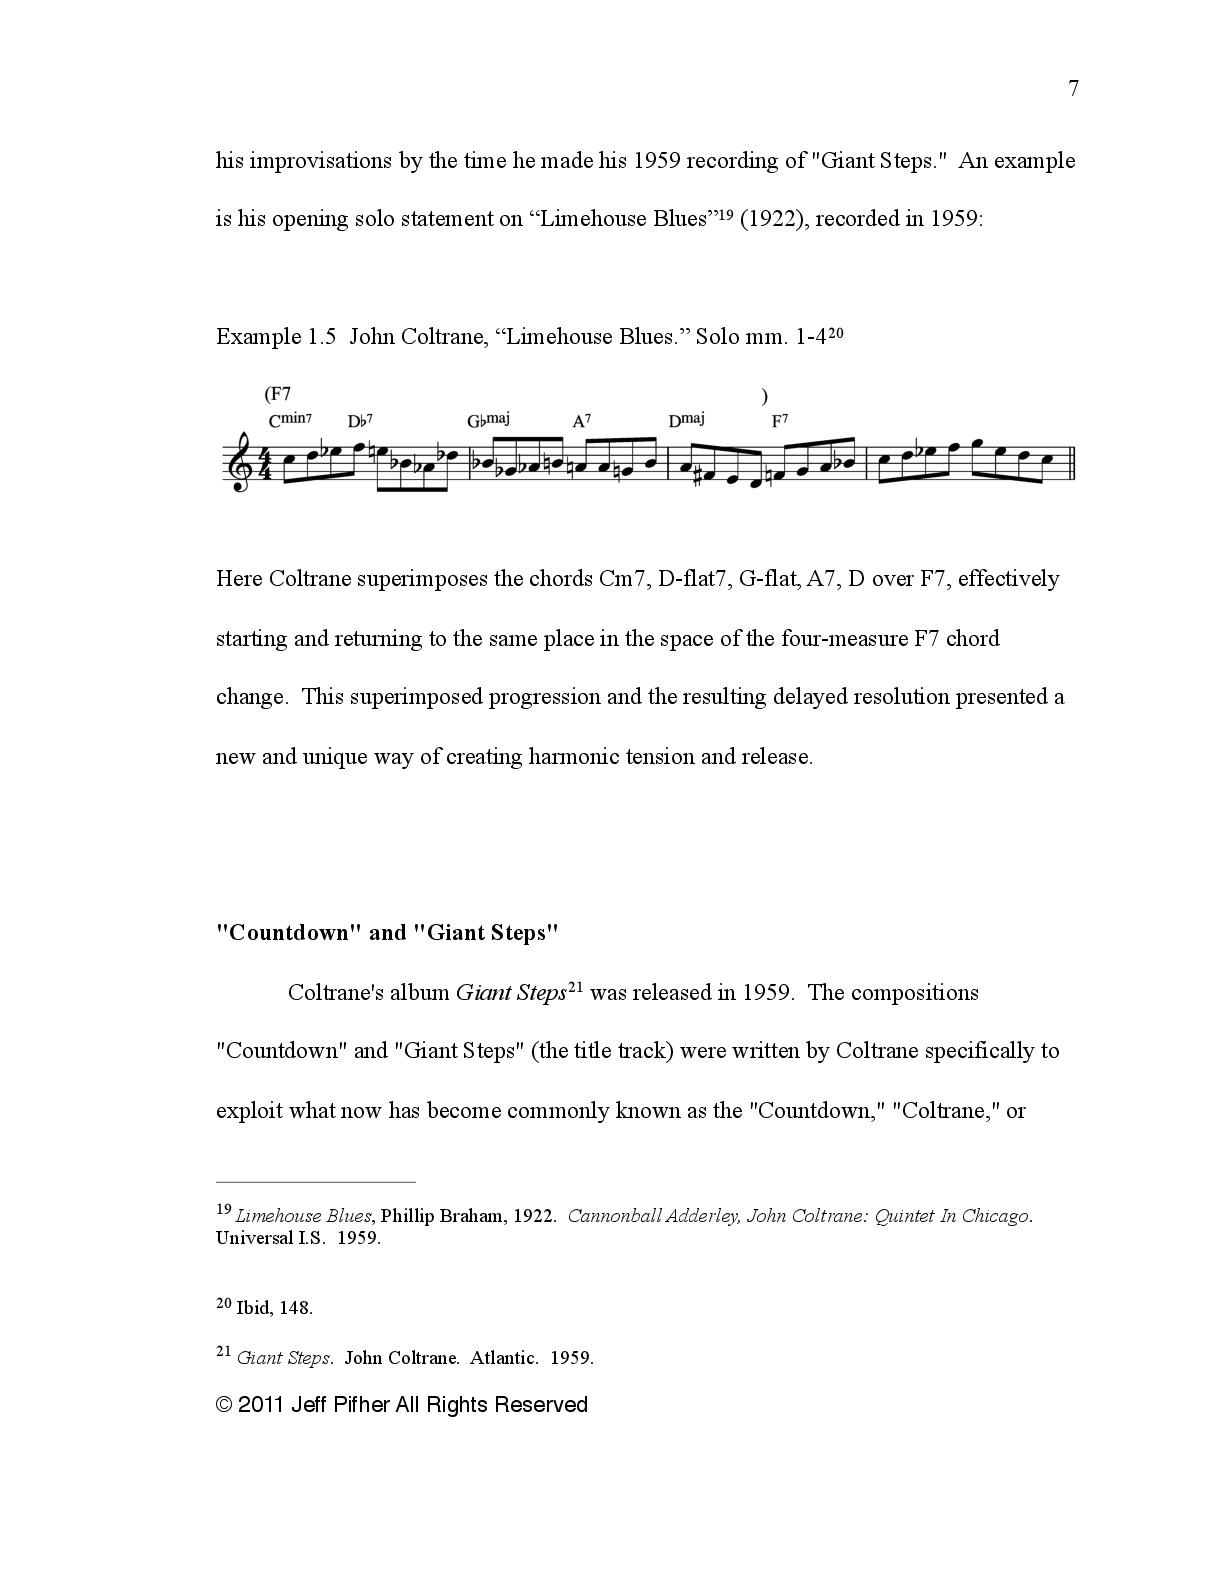 Jeff-Pifher-Academic-Series-Coltrane-Cycles-007.jpg